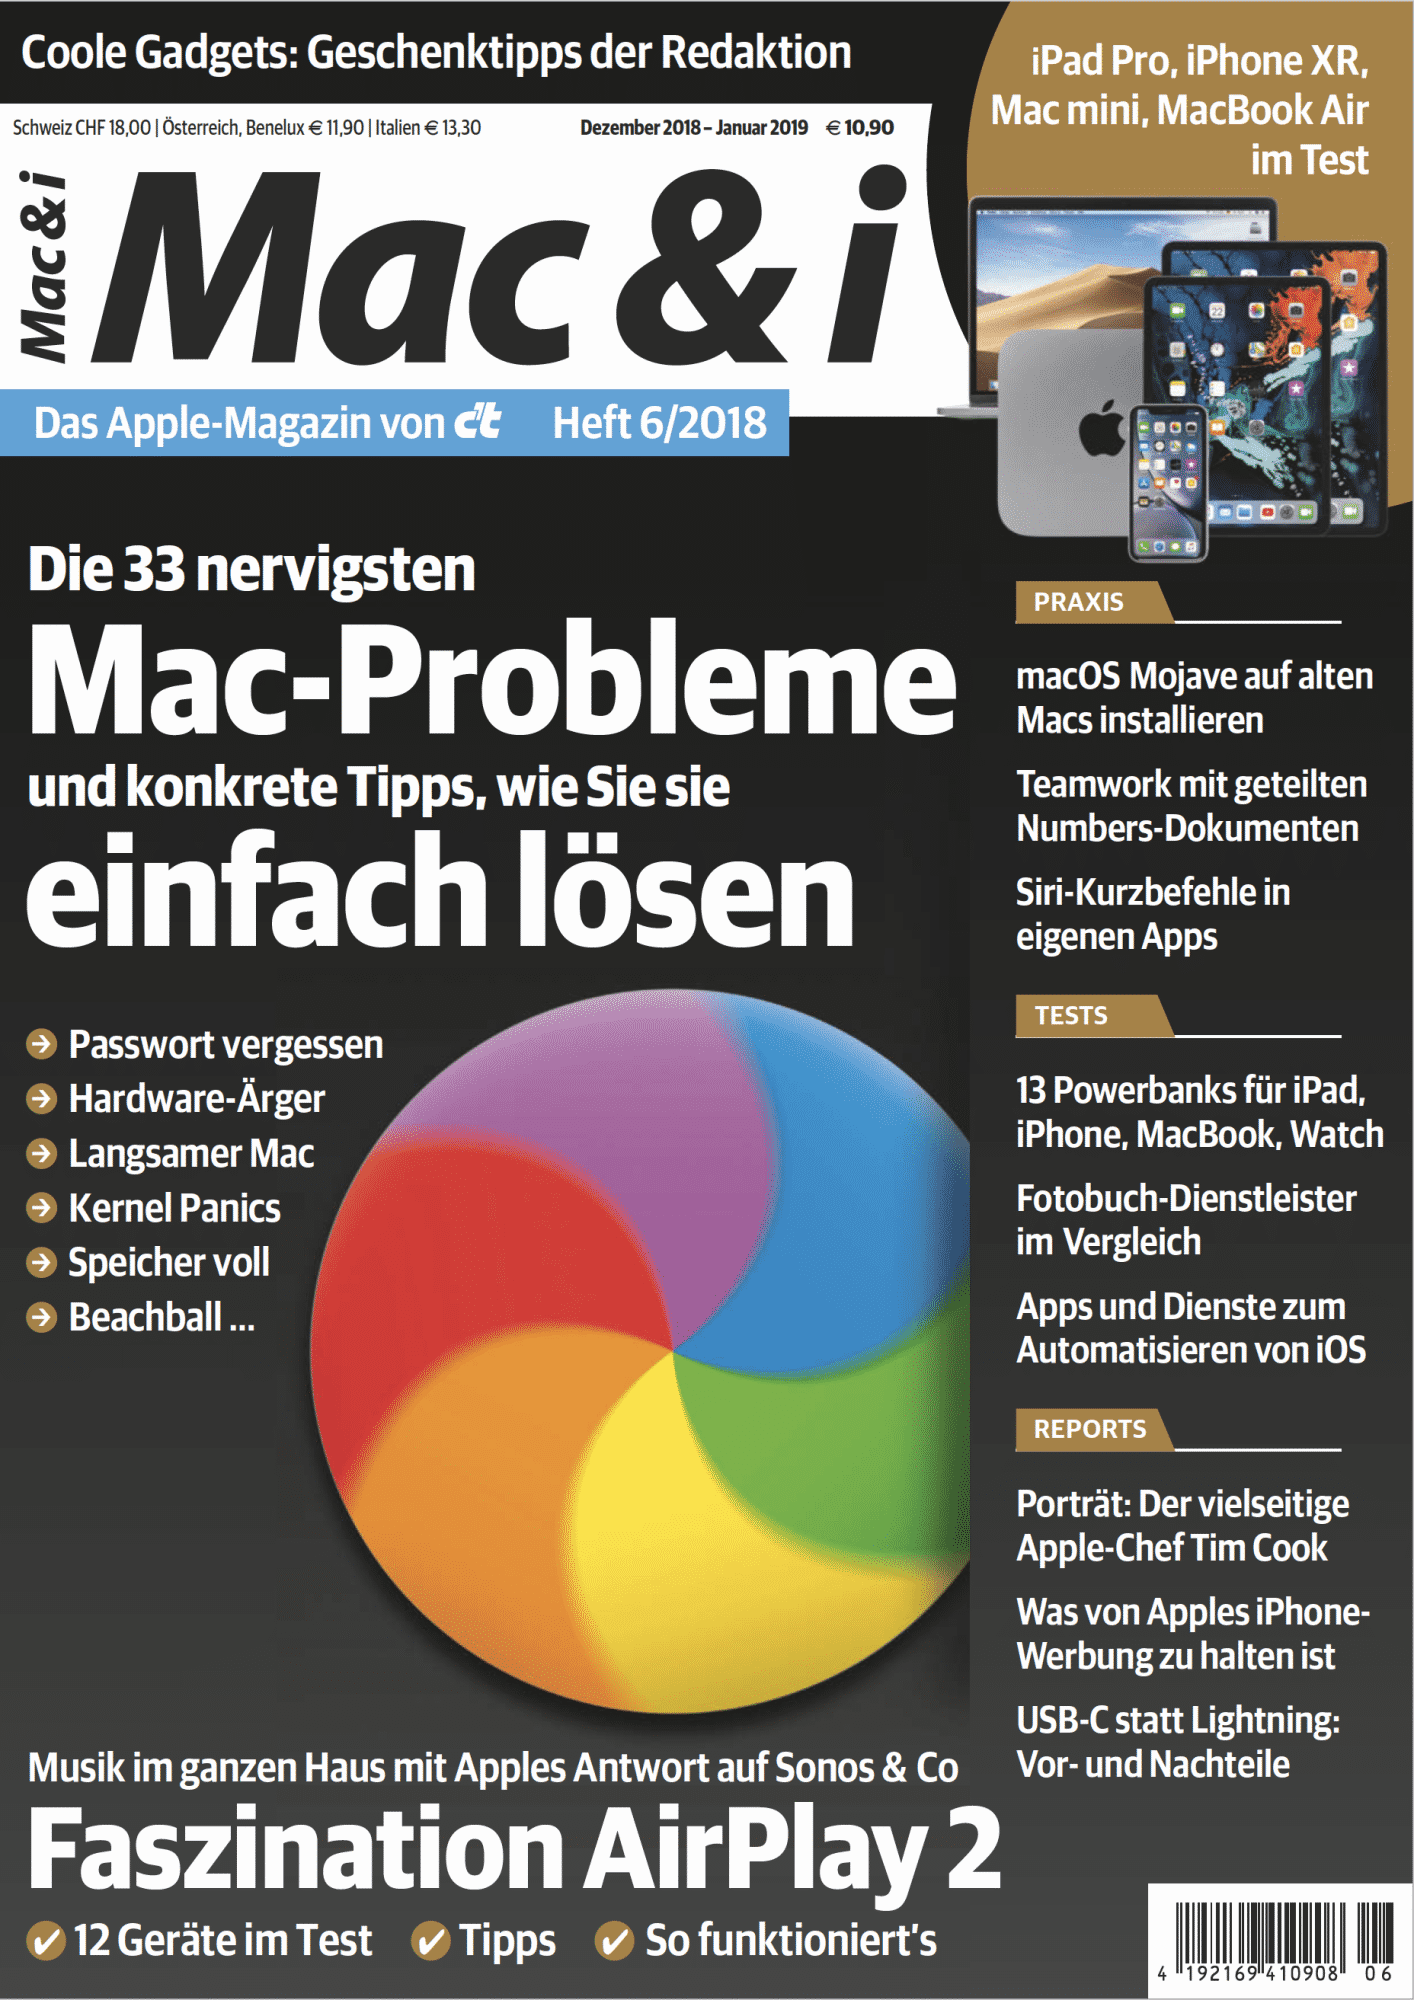 Mac & i Heft 6/2018: Titelbild…